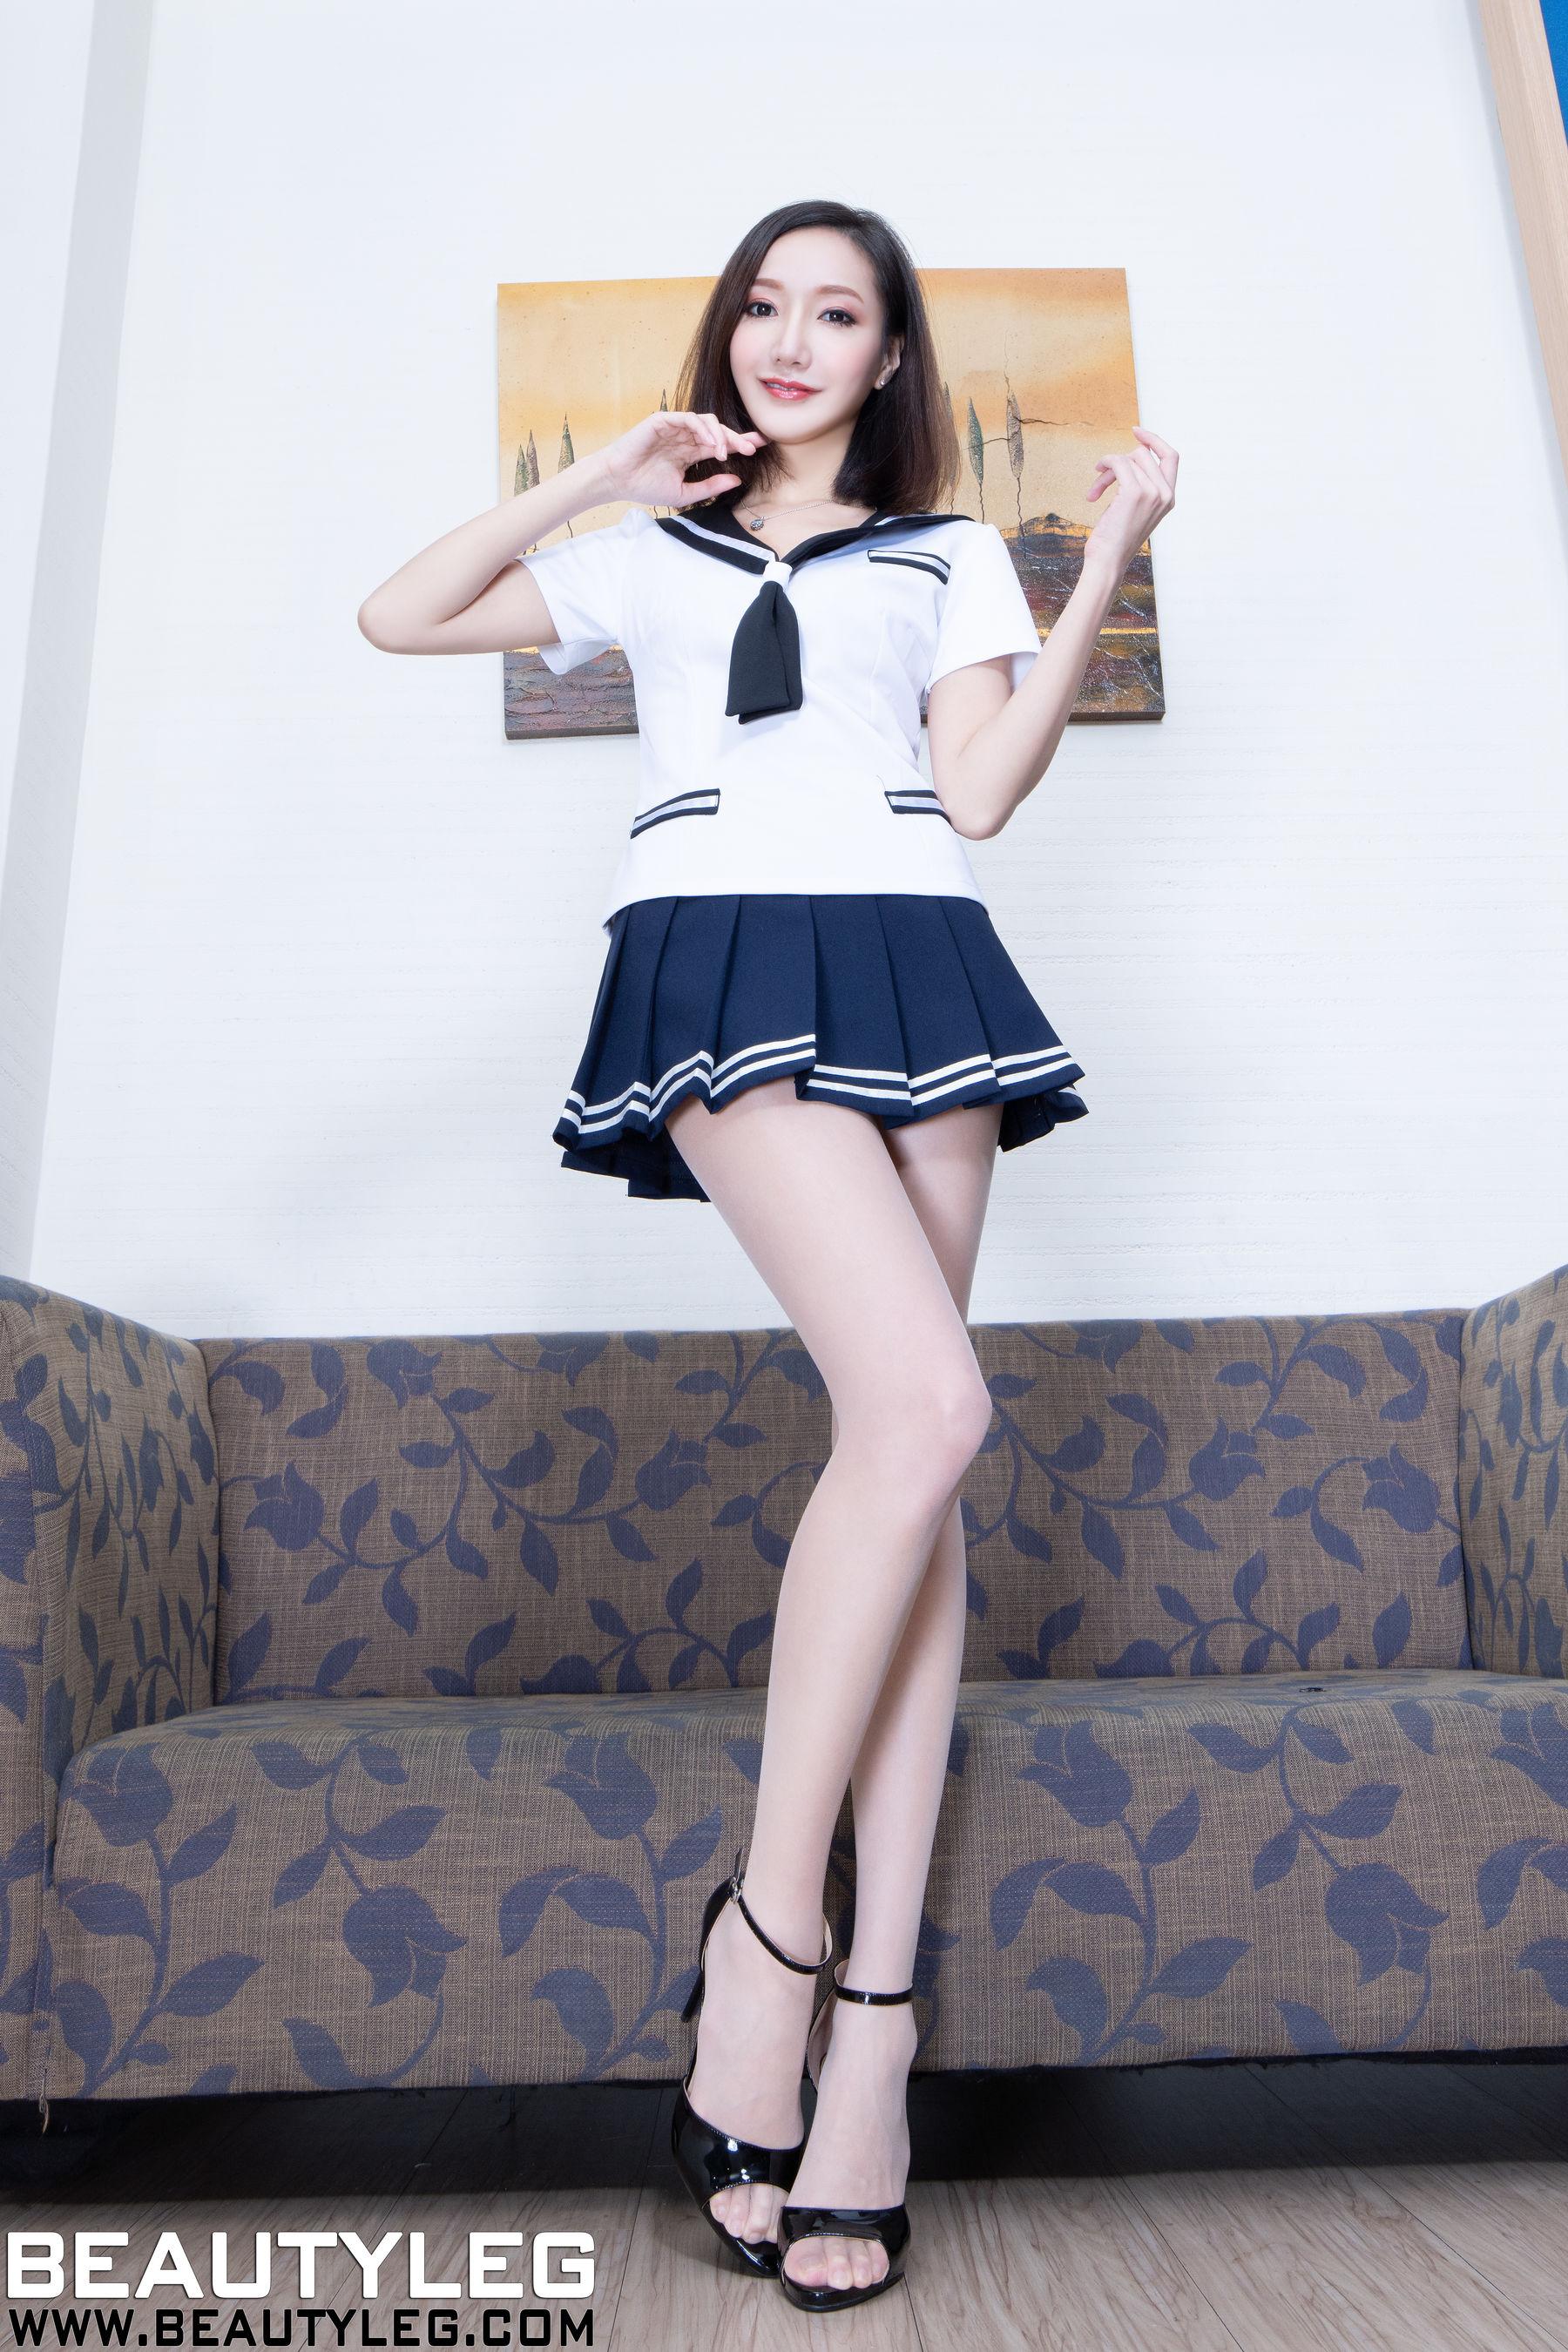 VOL.1363 [Beautyleg]丝袜美腿:陈思婷(腿模Tina,李霜)超高清个人性感漂亮大图(33P)